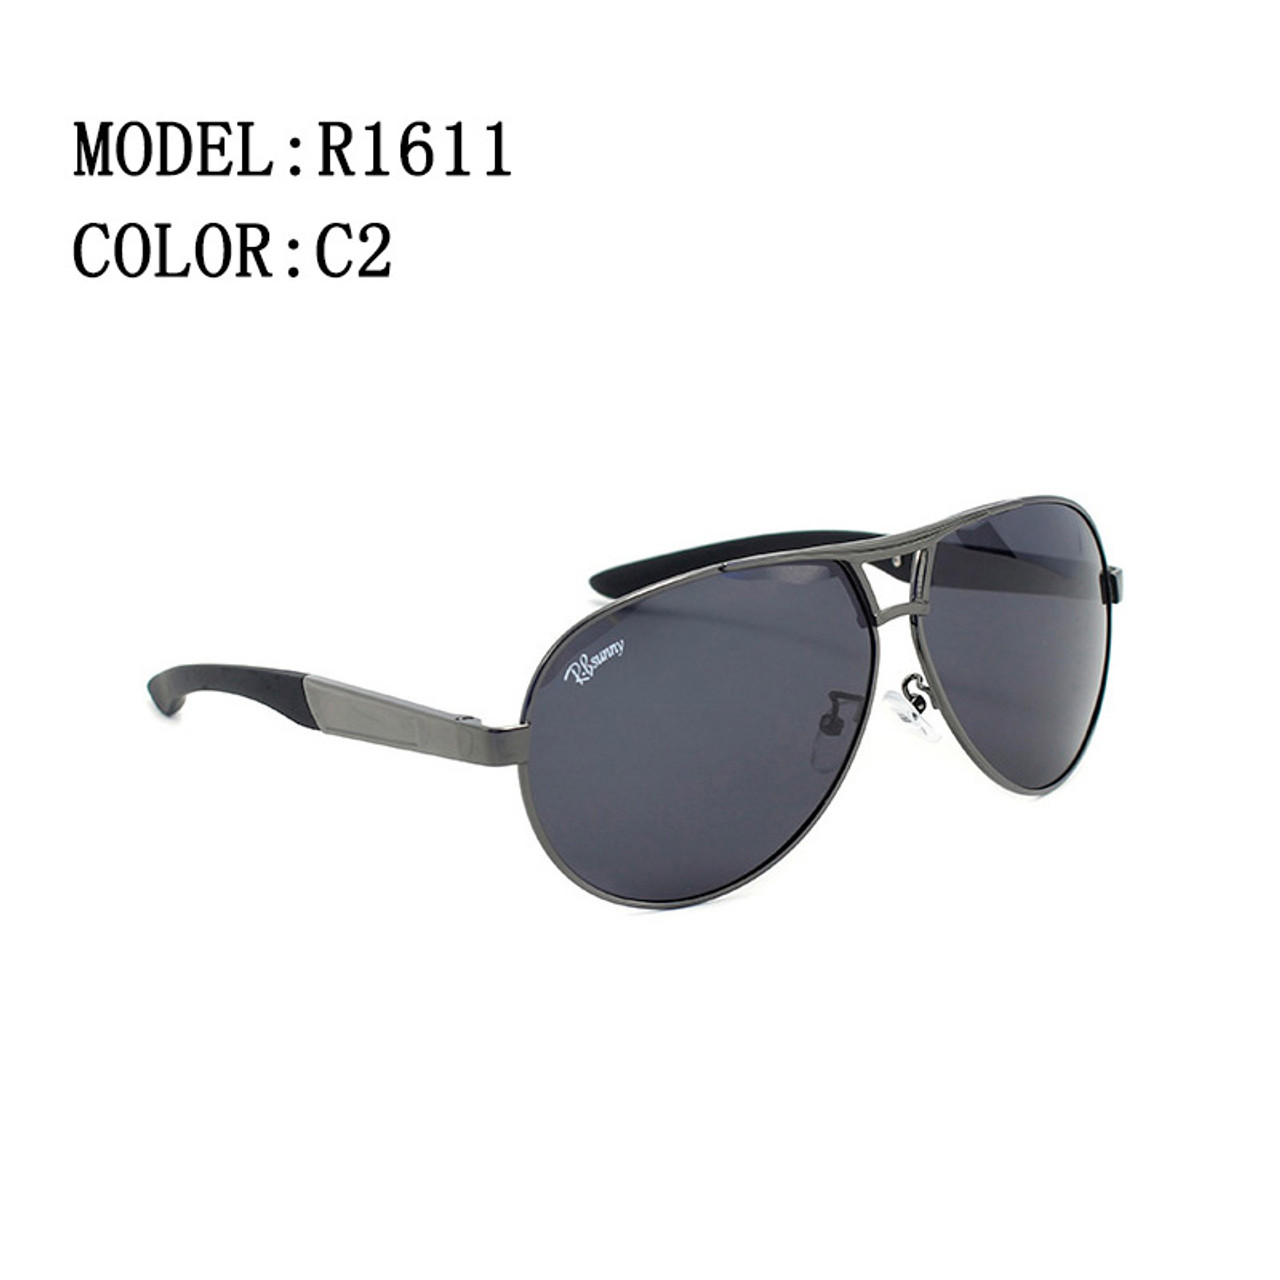 Fashion Brands polarized sunglasses Men Business Classic high quality sunglasses